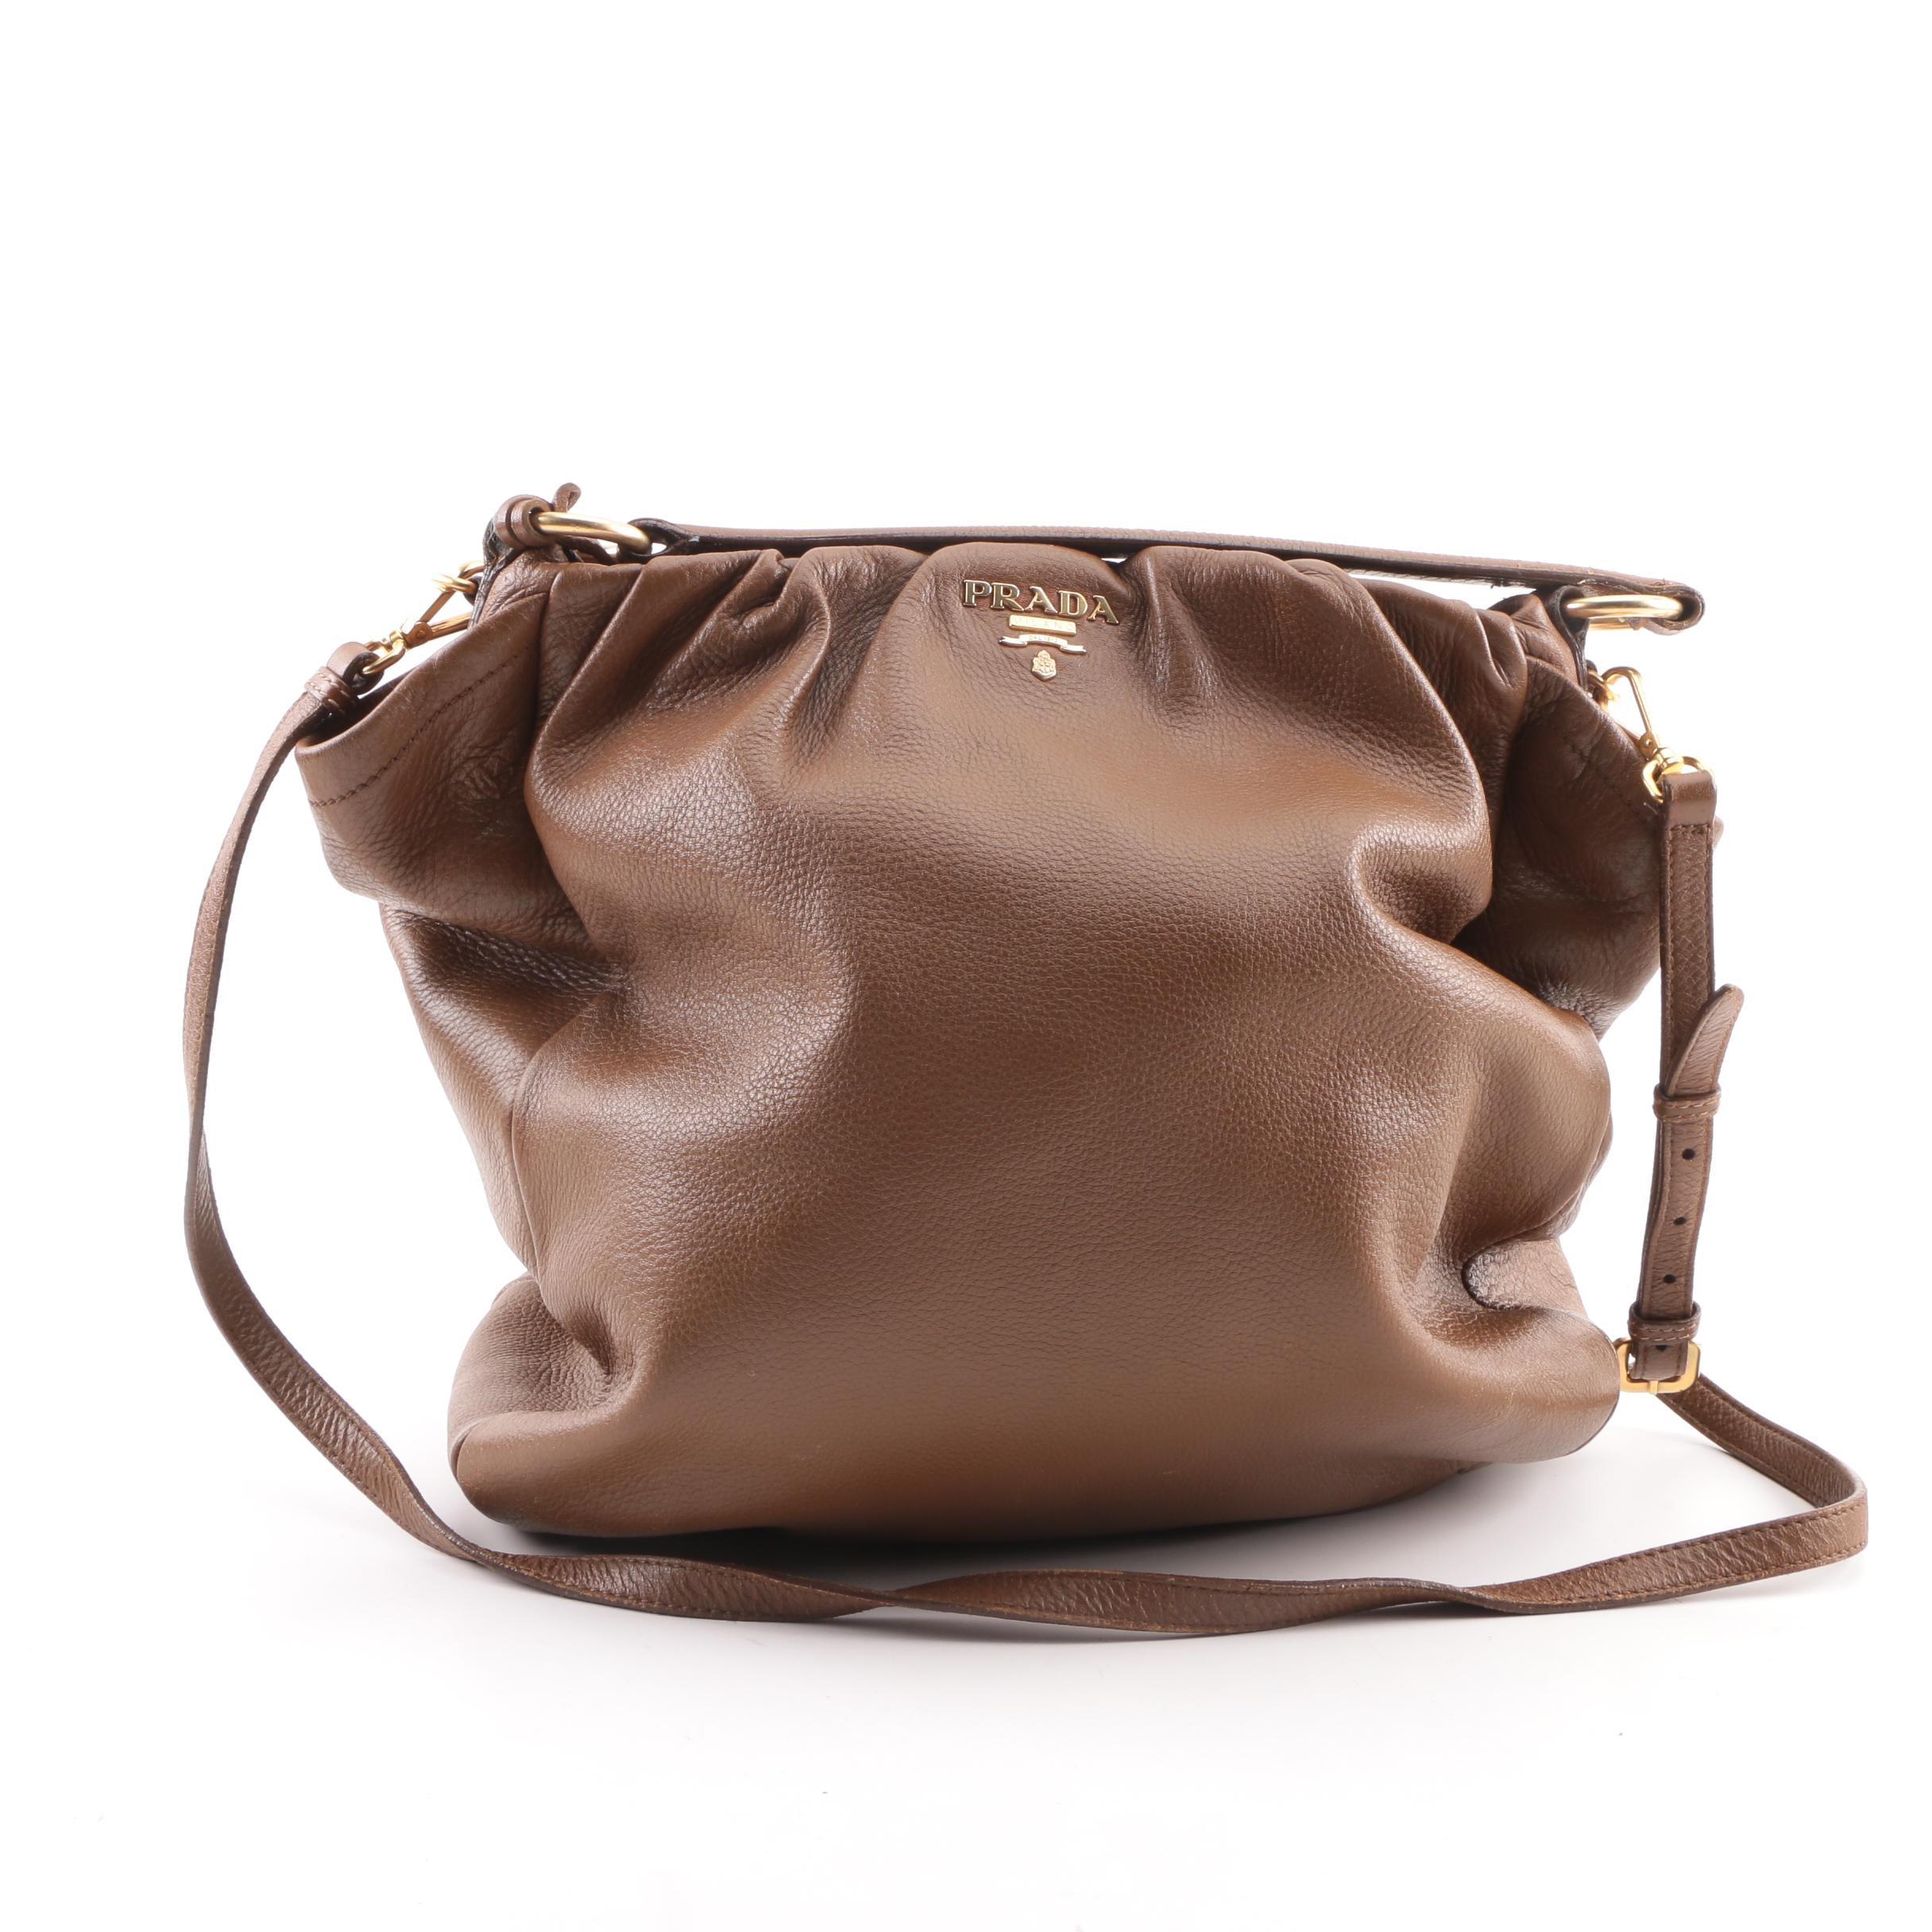 Prada Brown Leather Shoulder Satchel